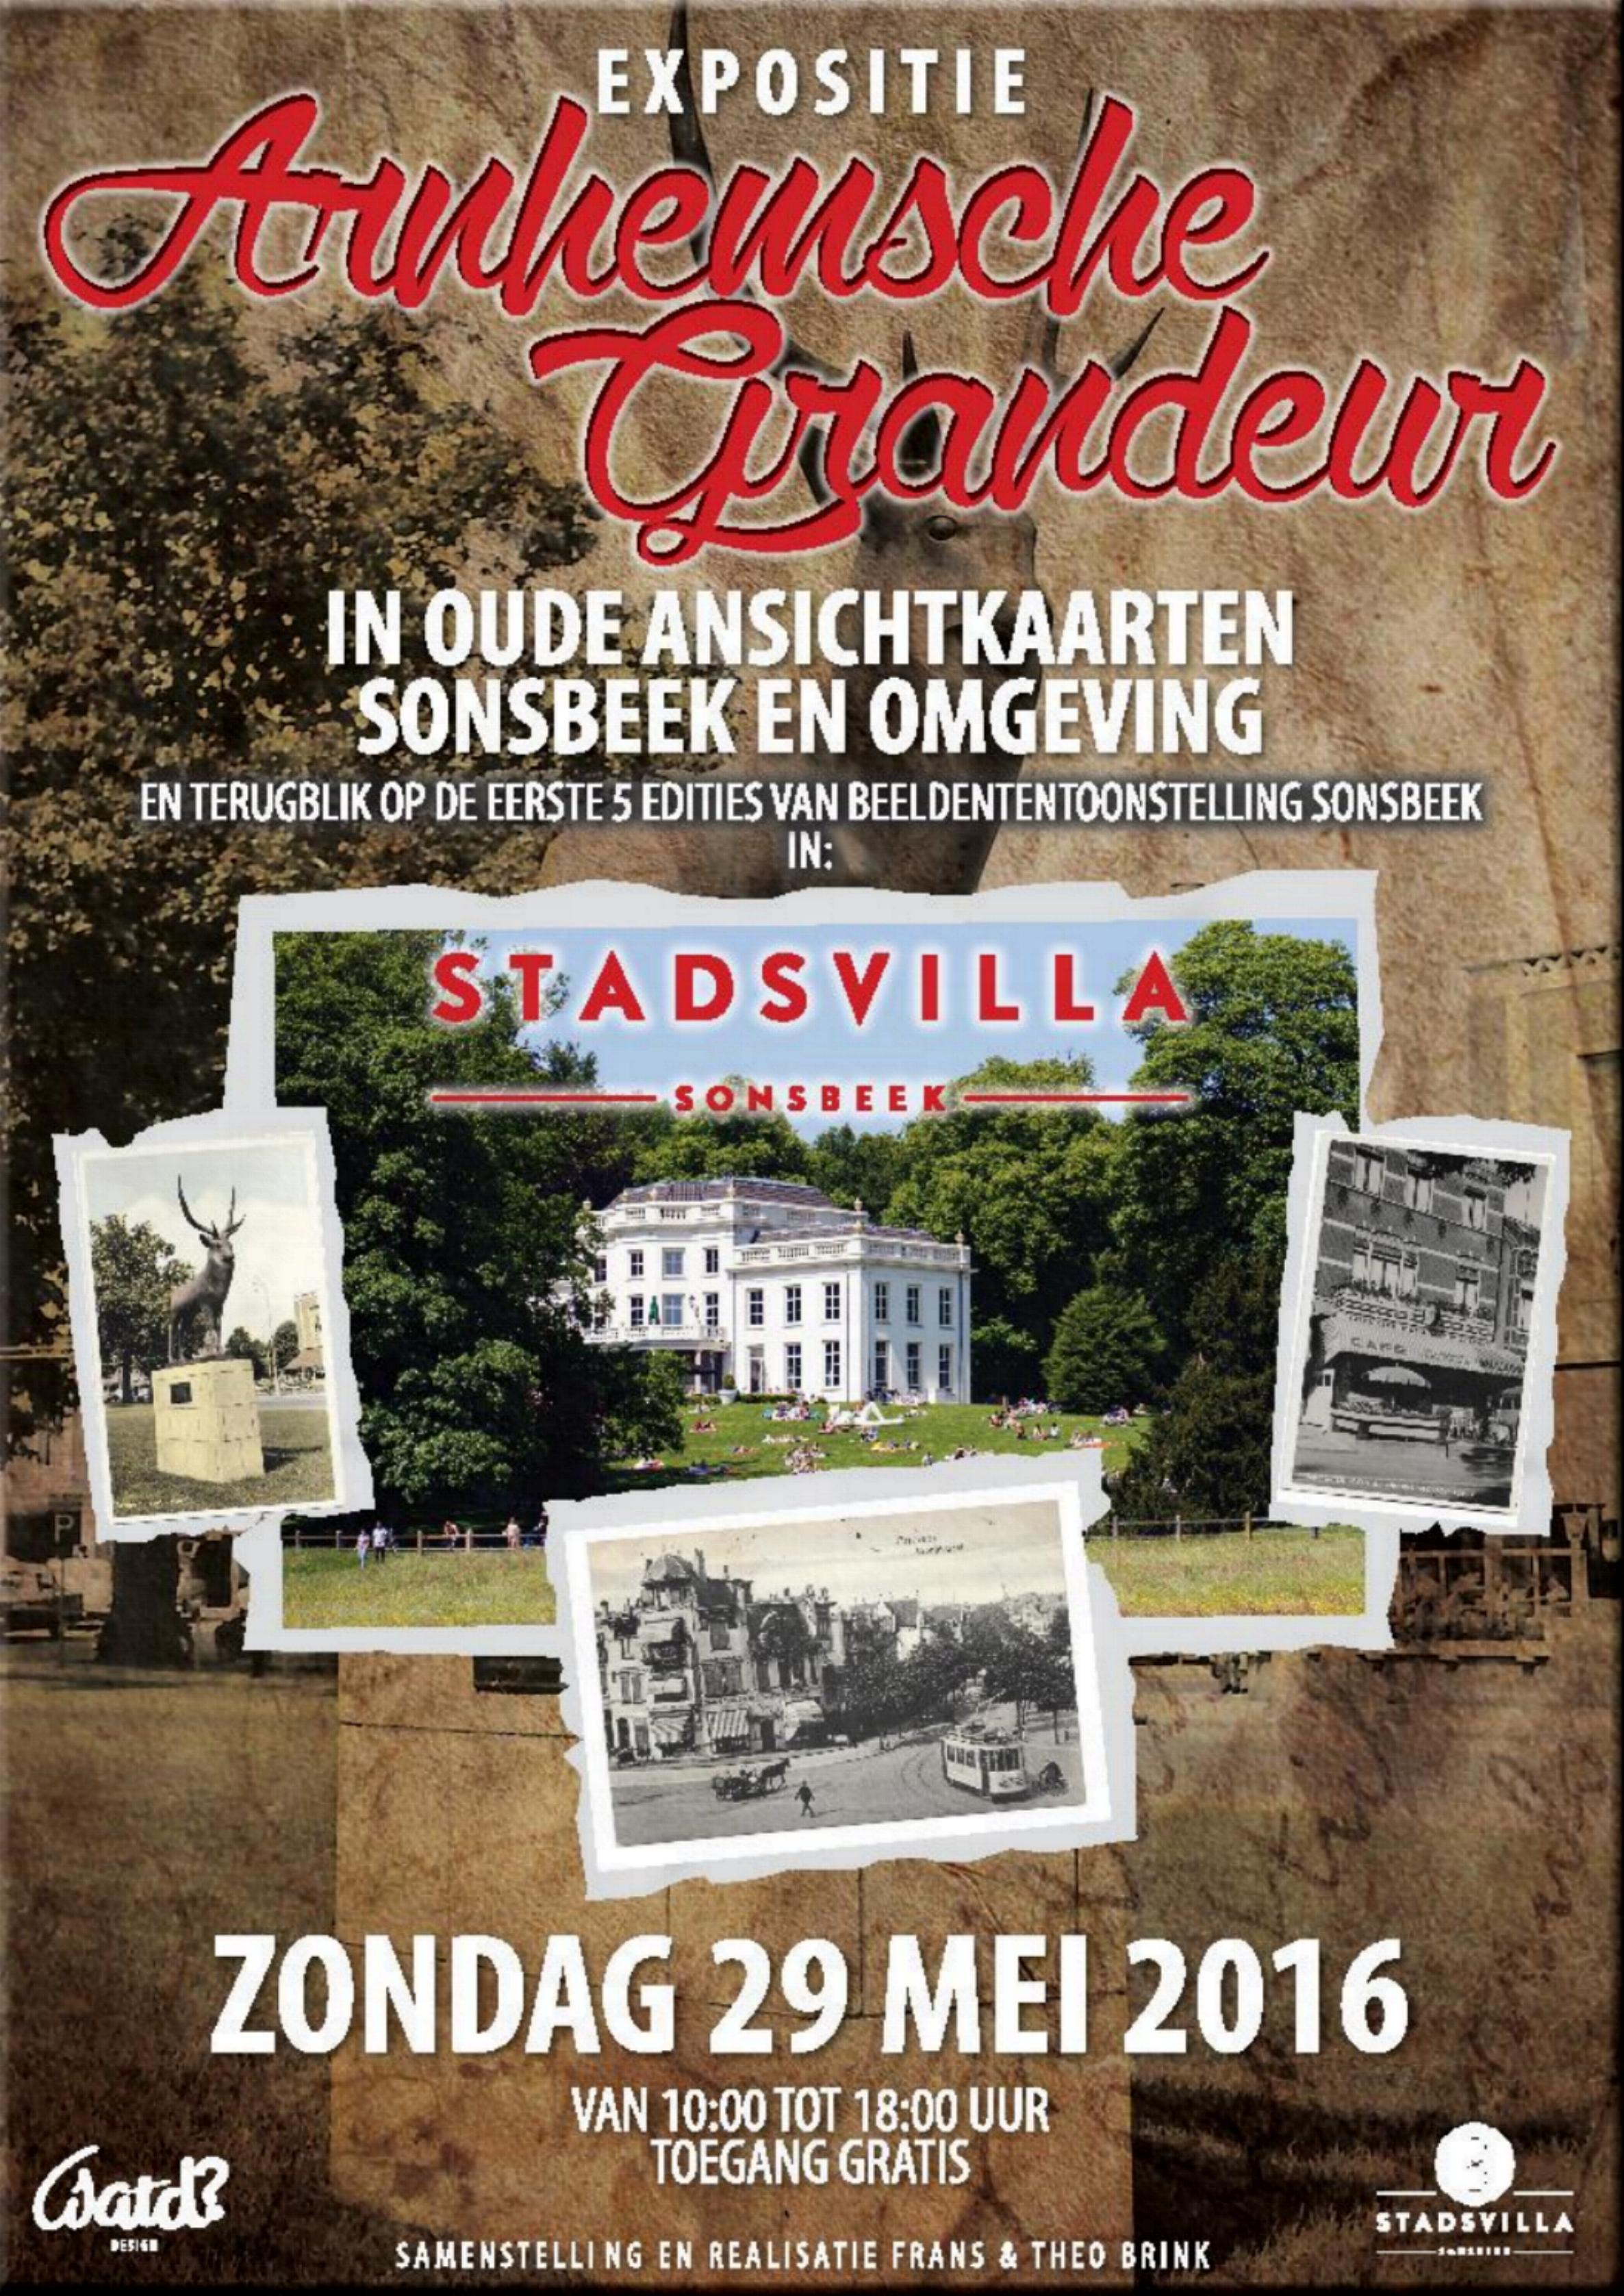 Arnhemsche Grandeur in oude ansichtkaarten